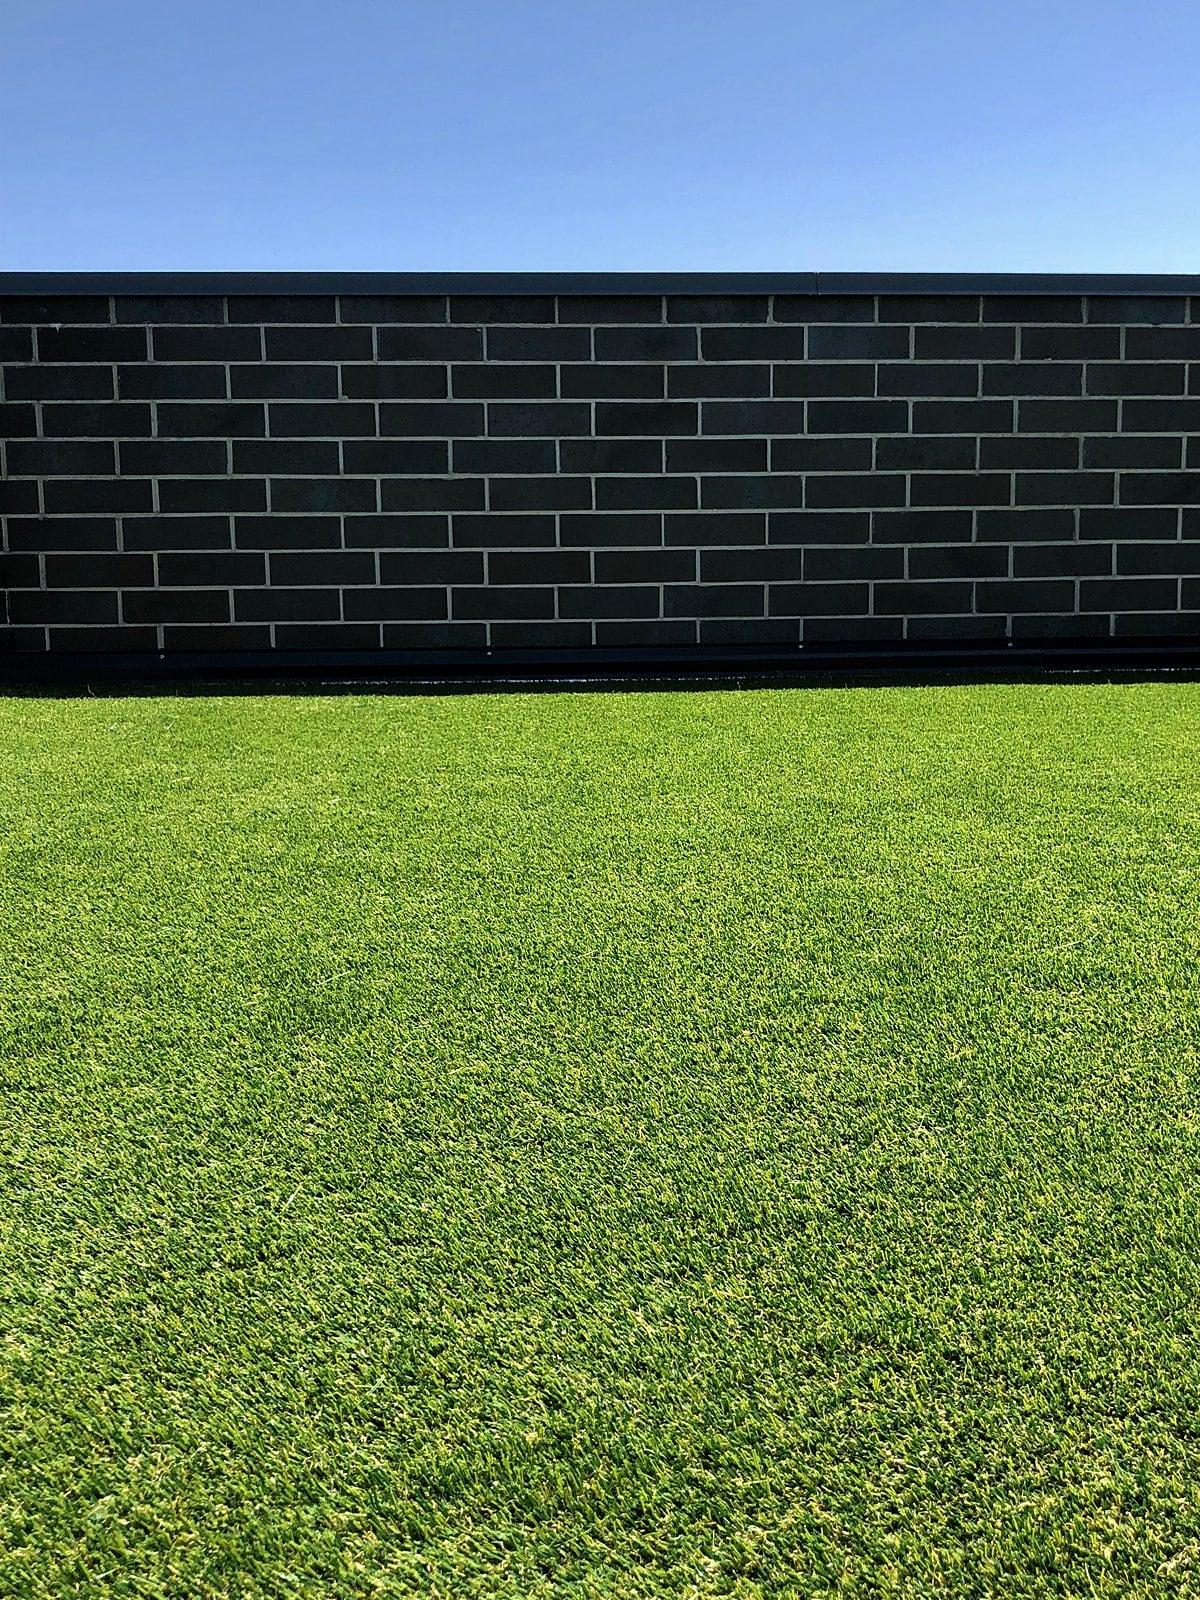 rooftop-lawn-grass-chicago-artificial lawn-turf-turf company-rooftop lawn-rooftop landscape-artificial grass-pet turf-1-min